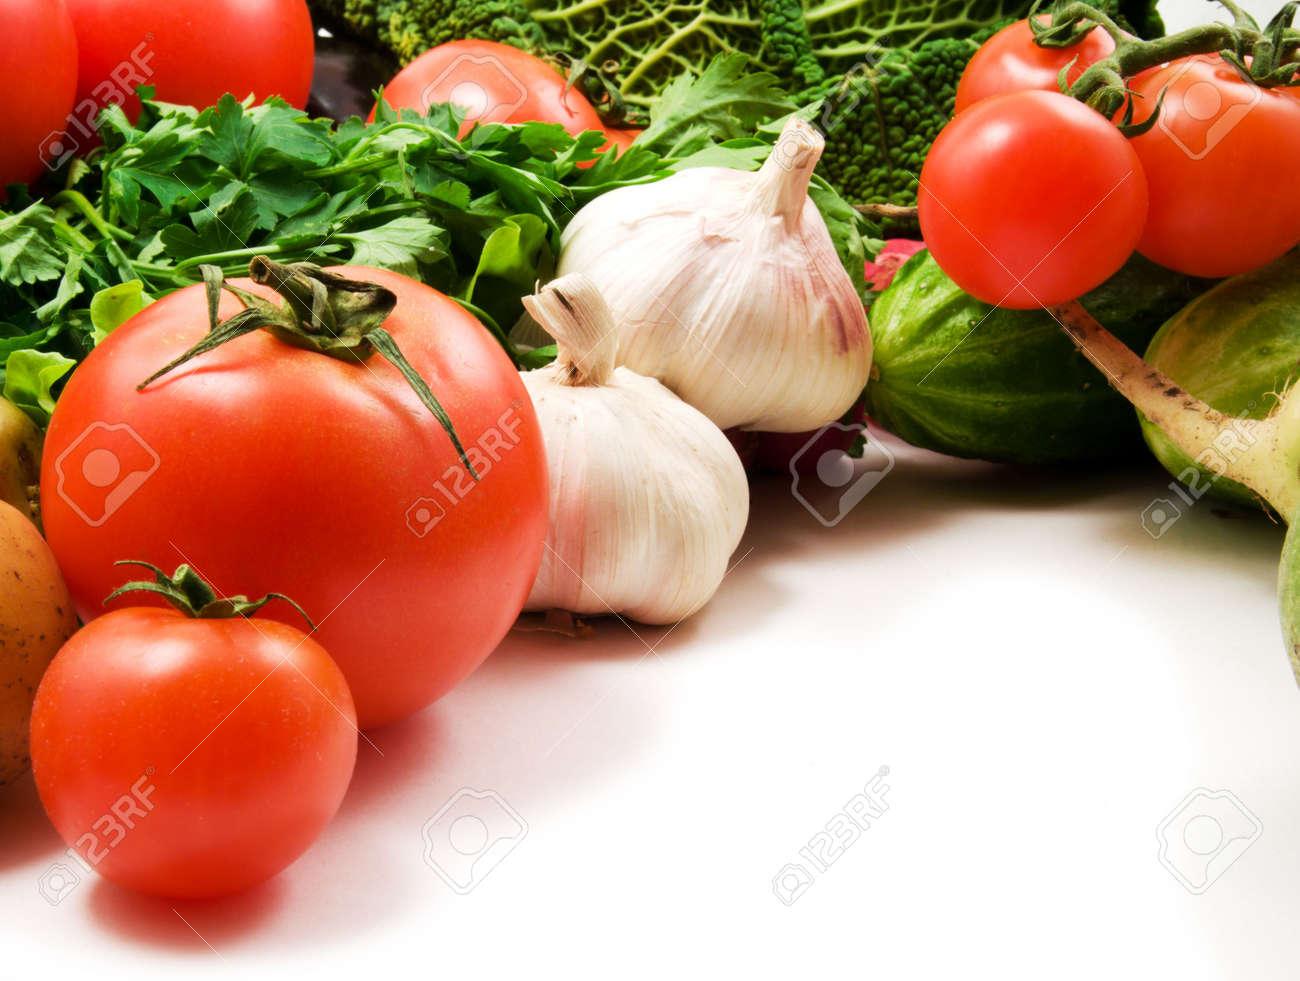 cabbage, squash, broccoli, pepper, tomatoes, onion on white background Stock Photo - 2736973